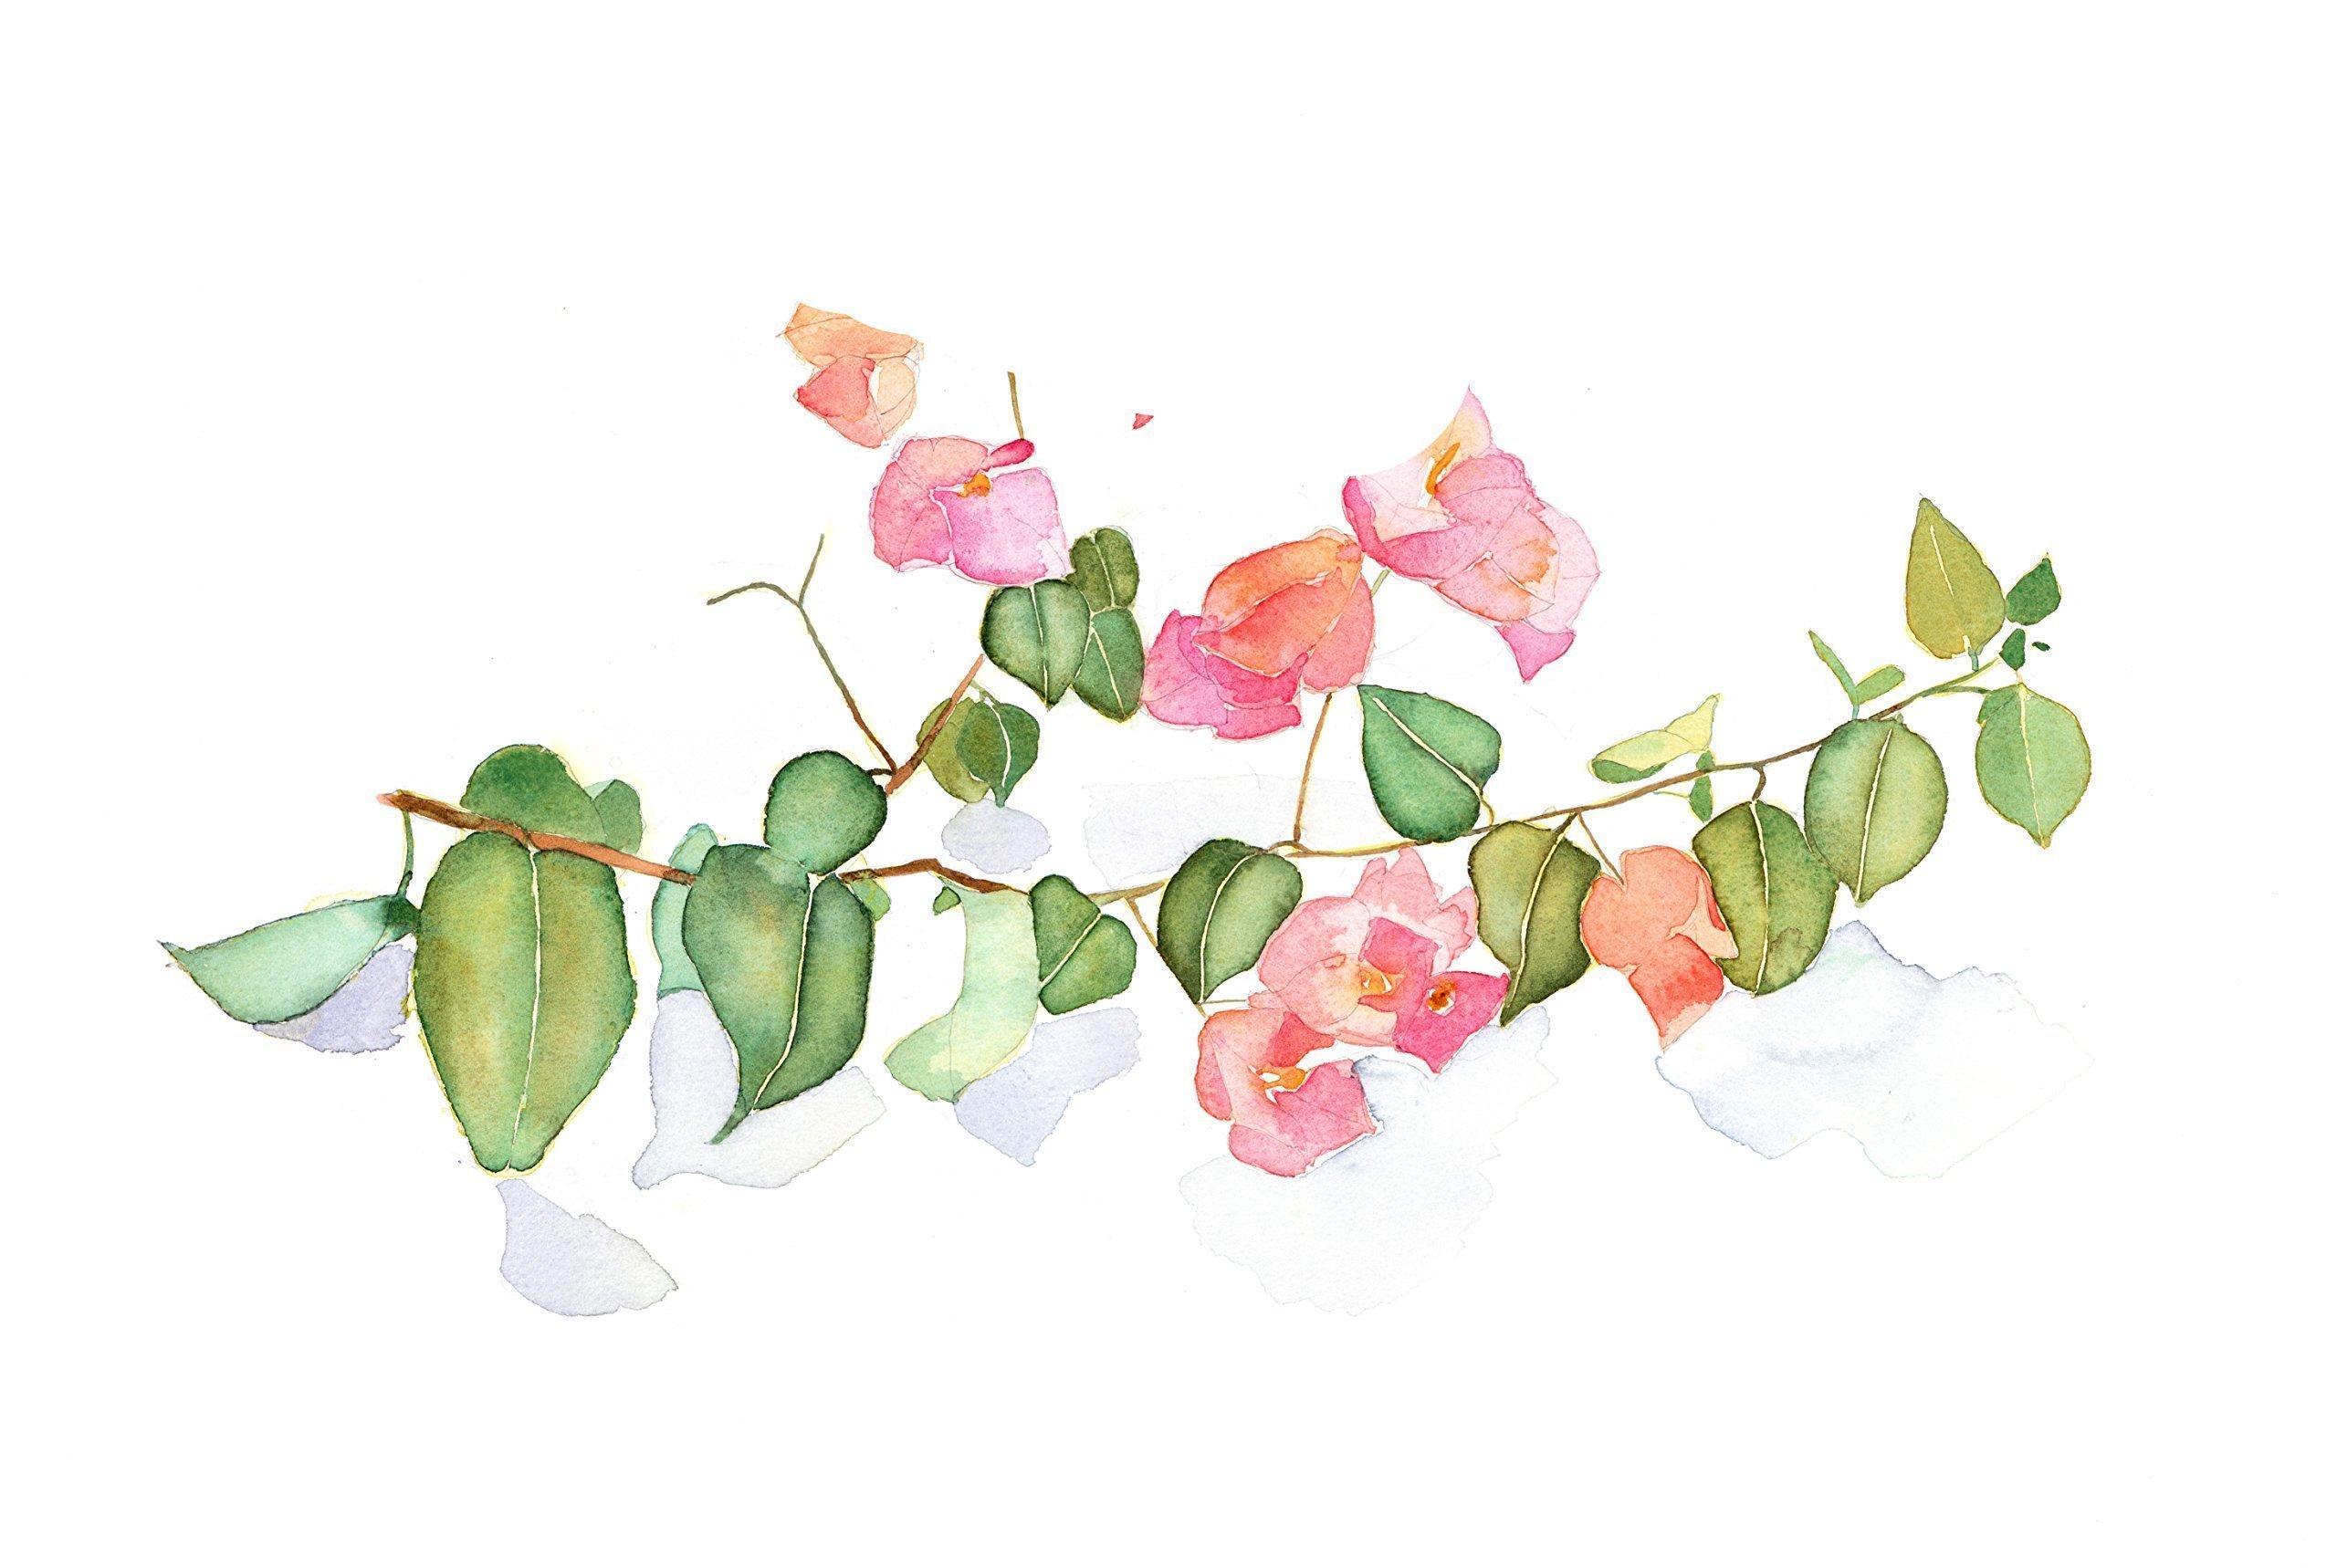 silk flower arrangements watercolor floral painting - fine art print, office, home decor, gift, bougainvillea